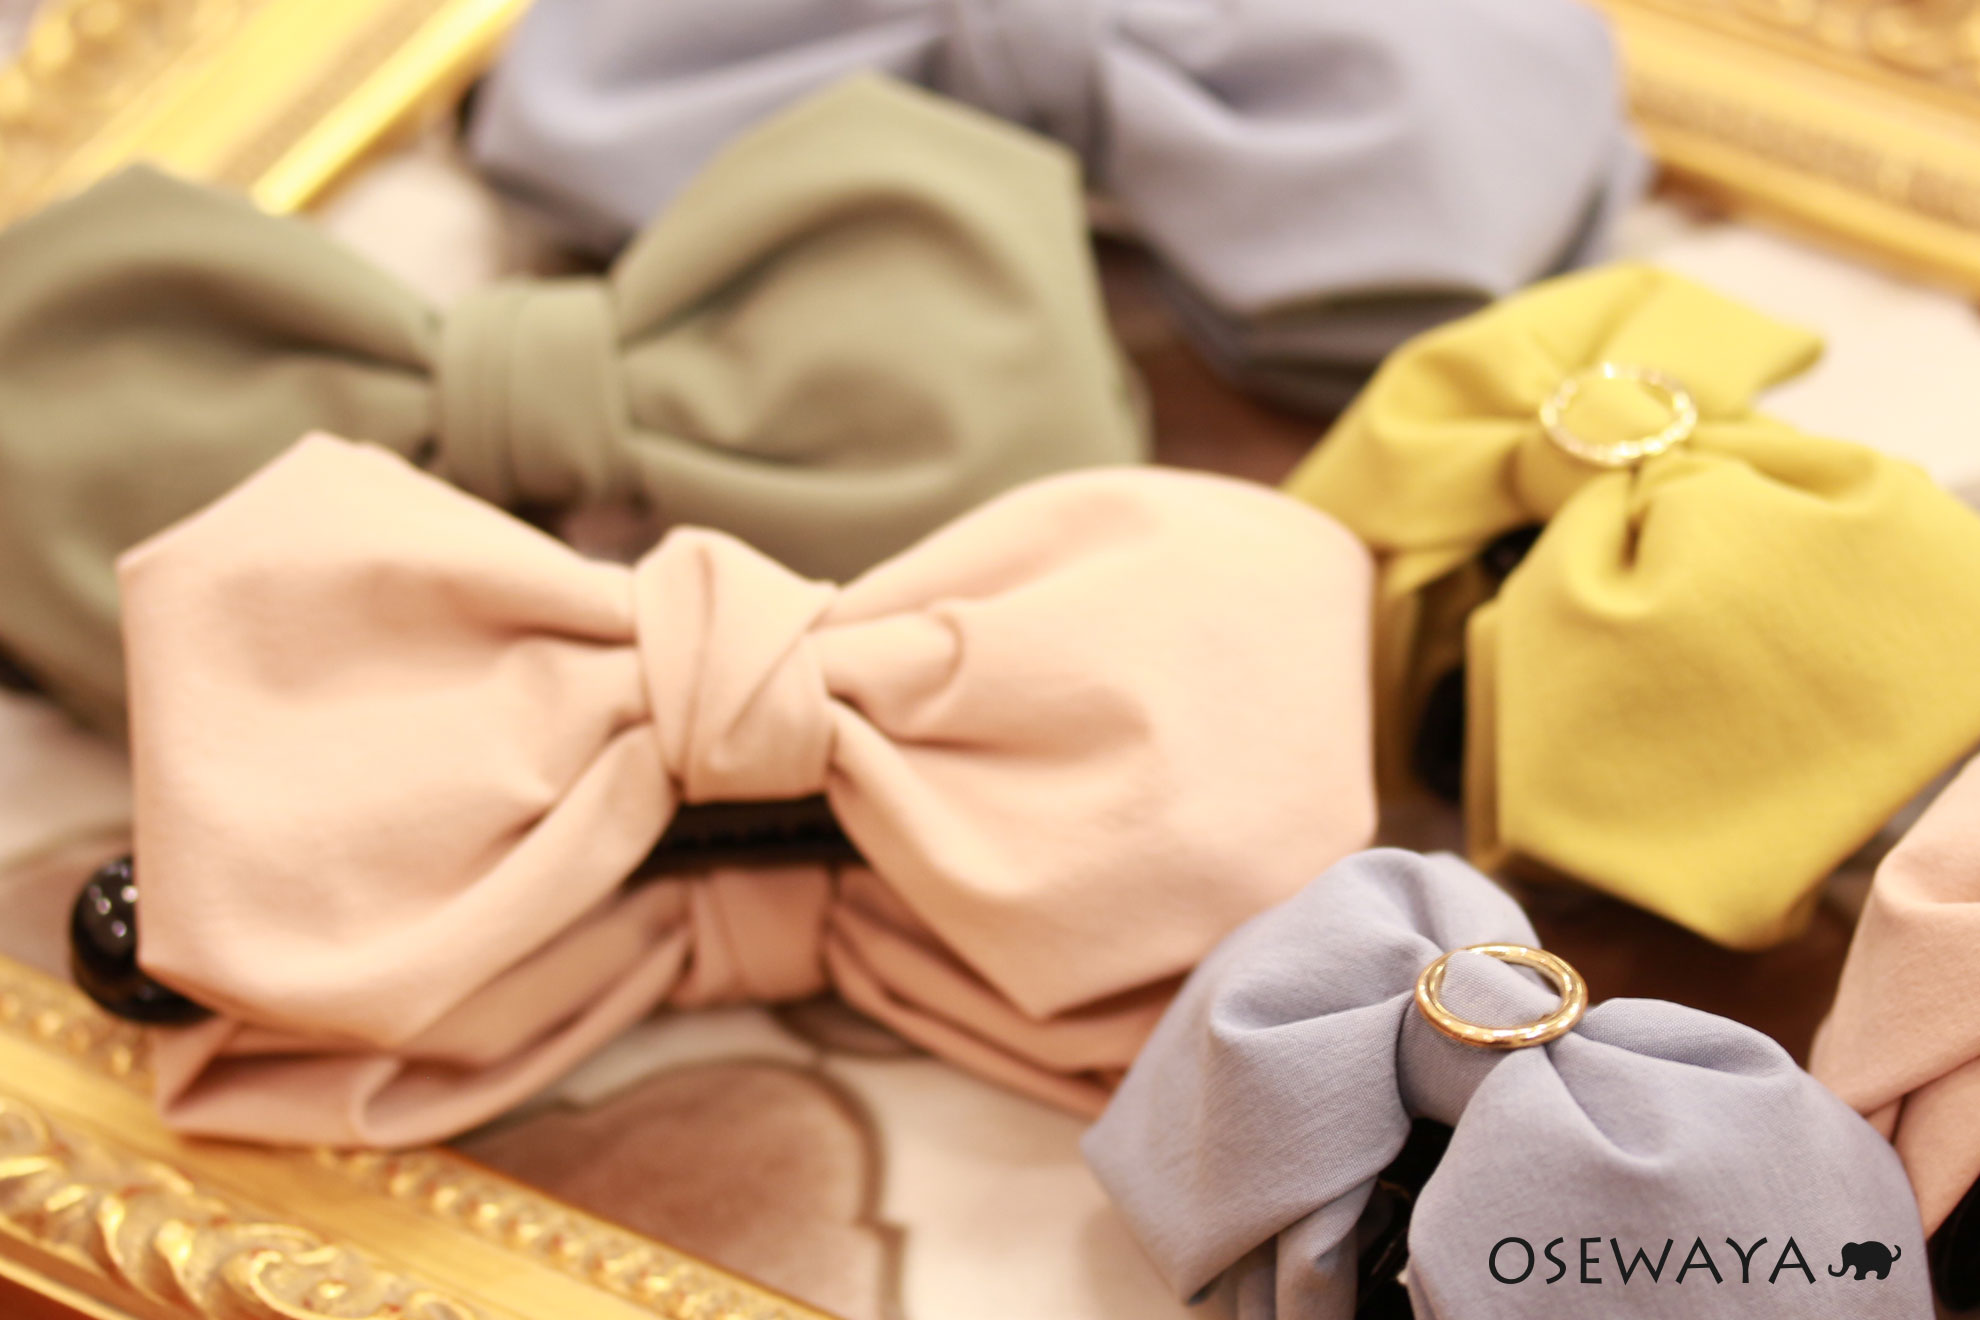 OSEWAYA_image2019